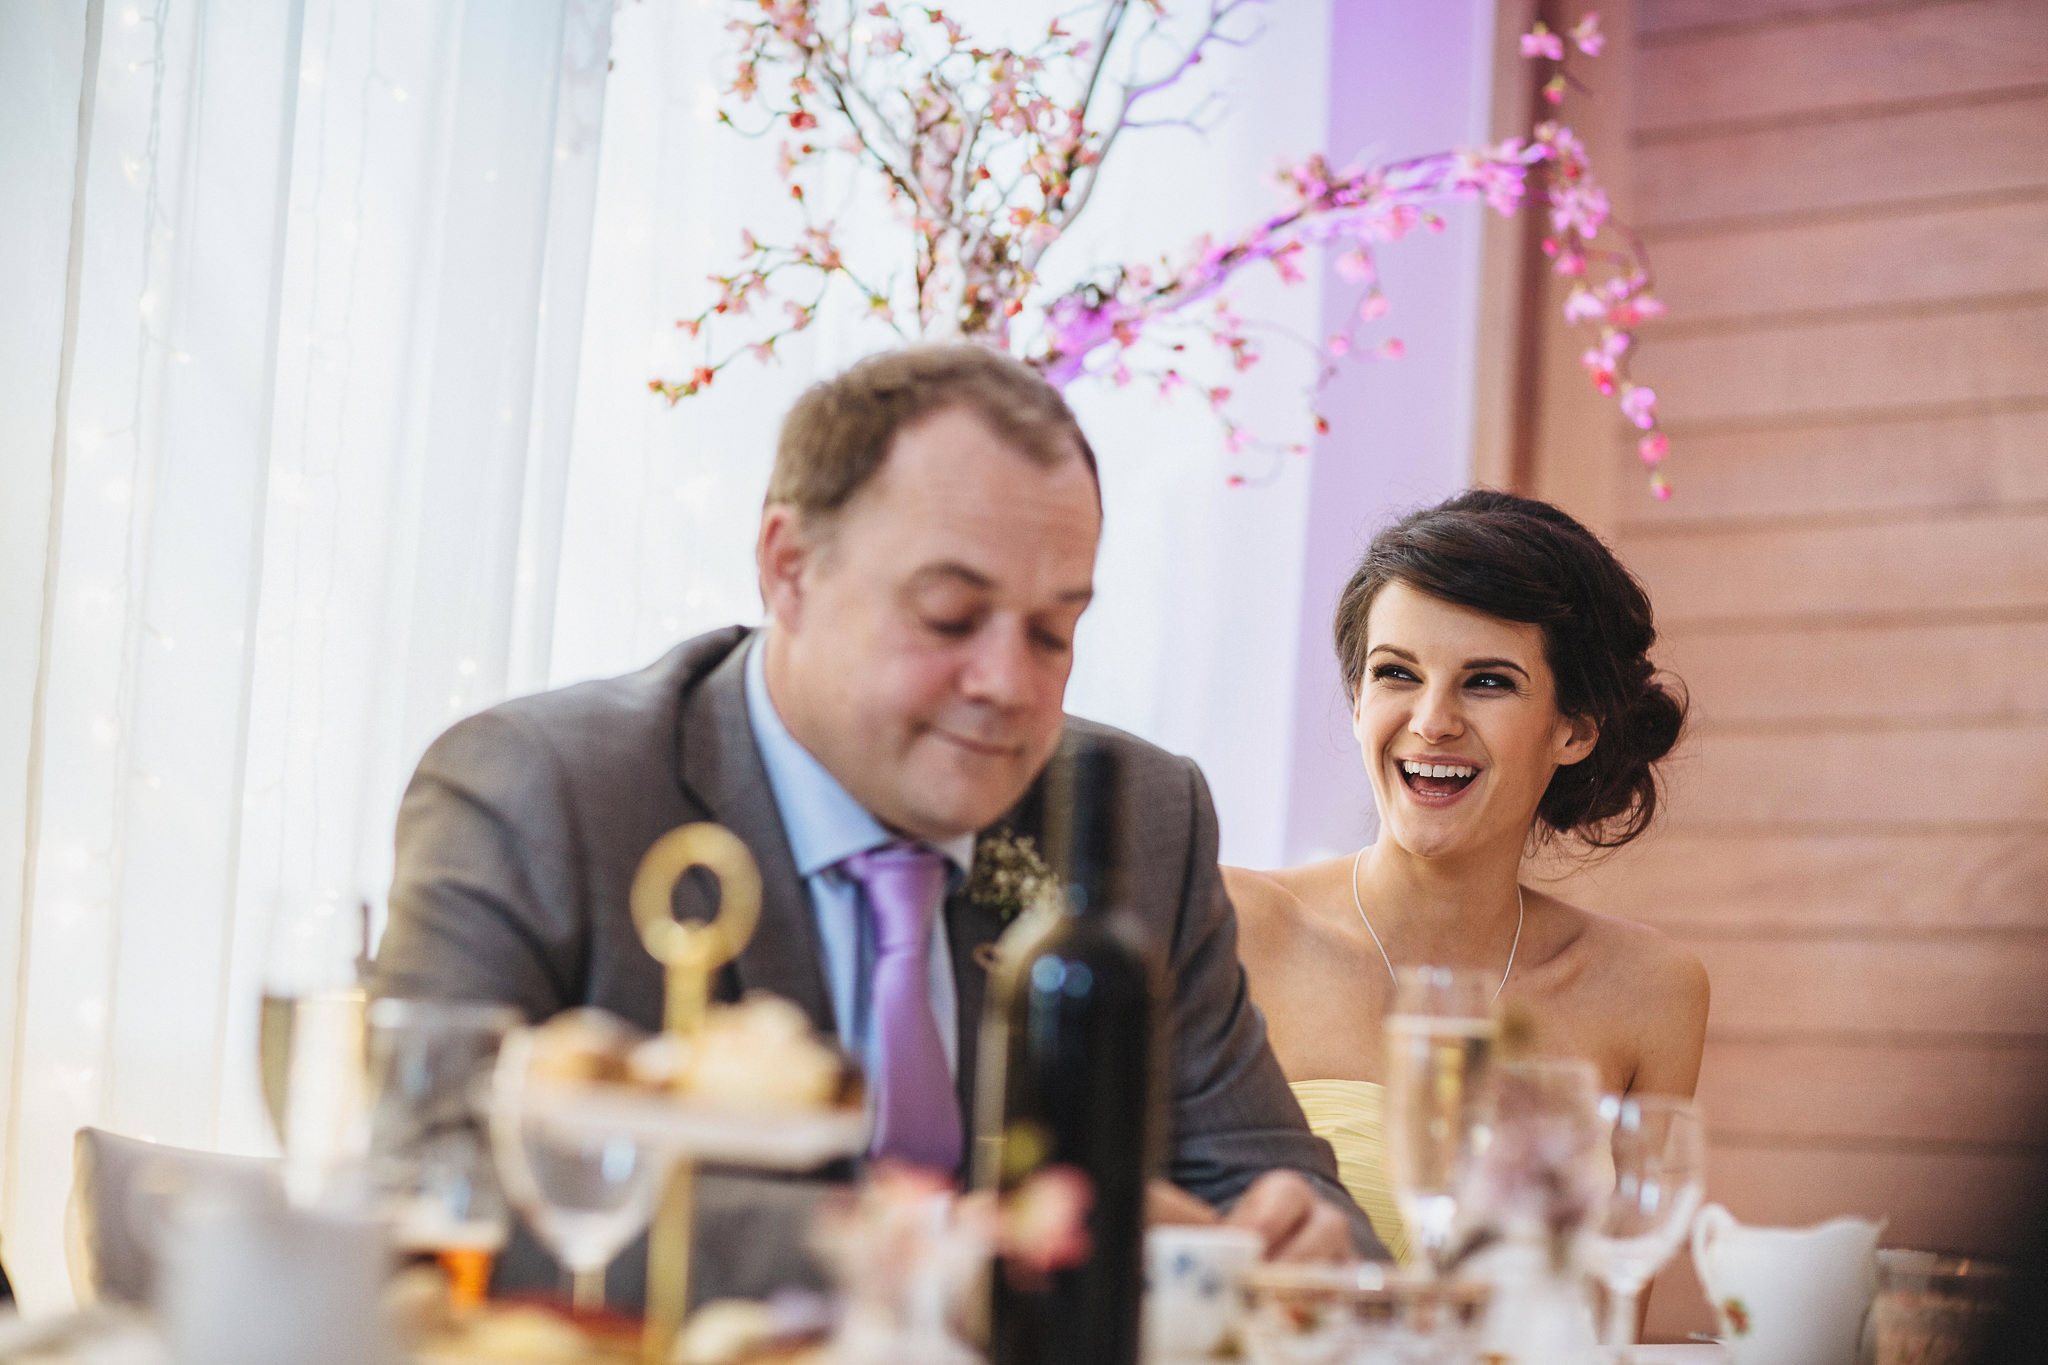 Lancashire-Creative-natural-documentary-wedding-photography-90069